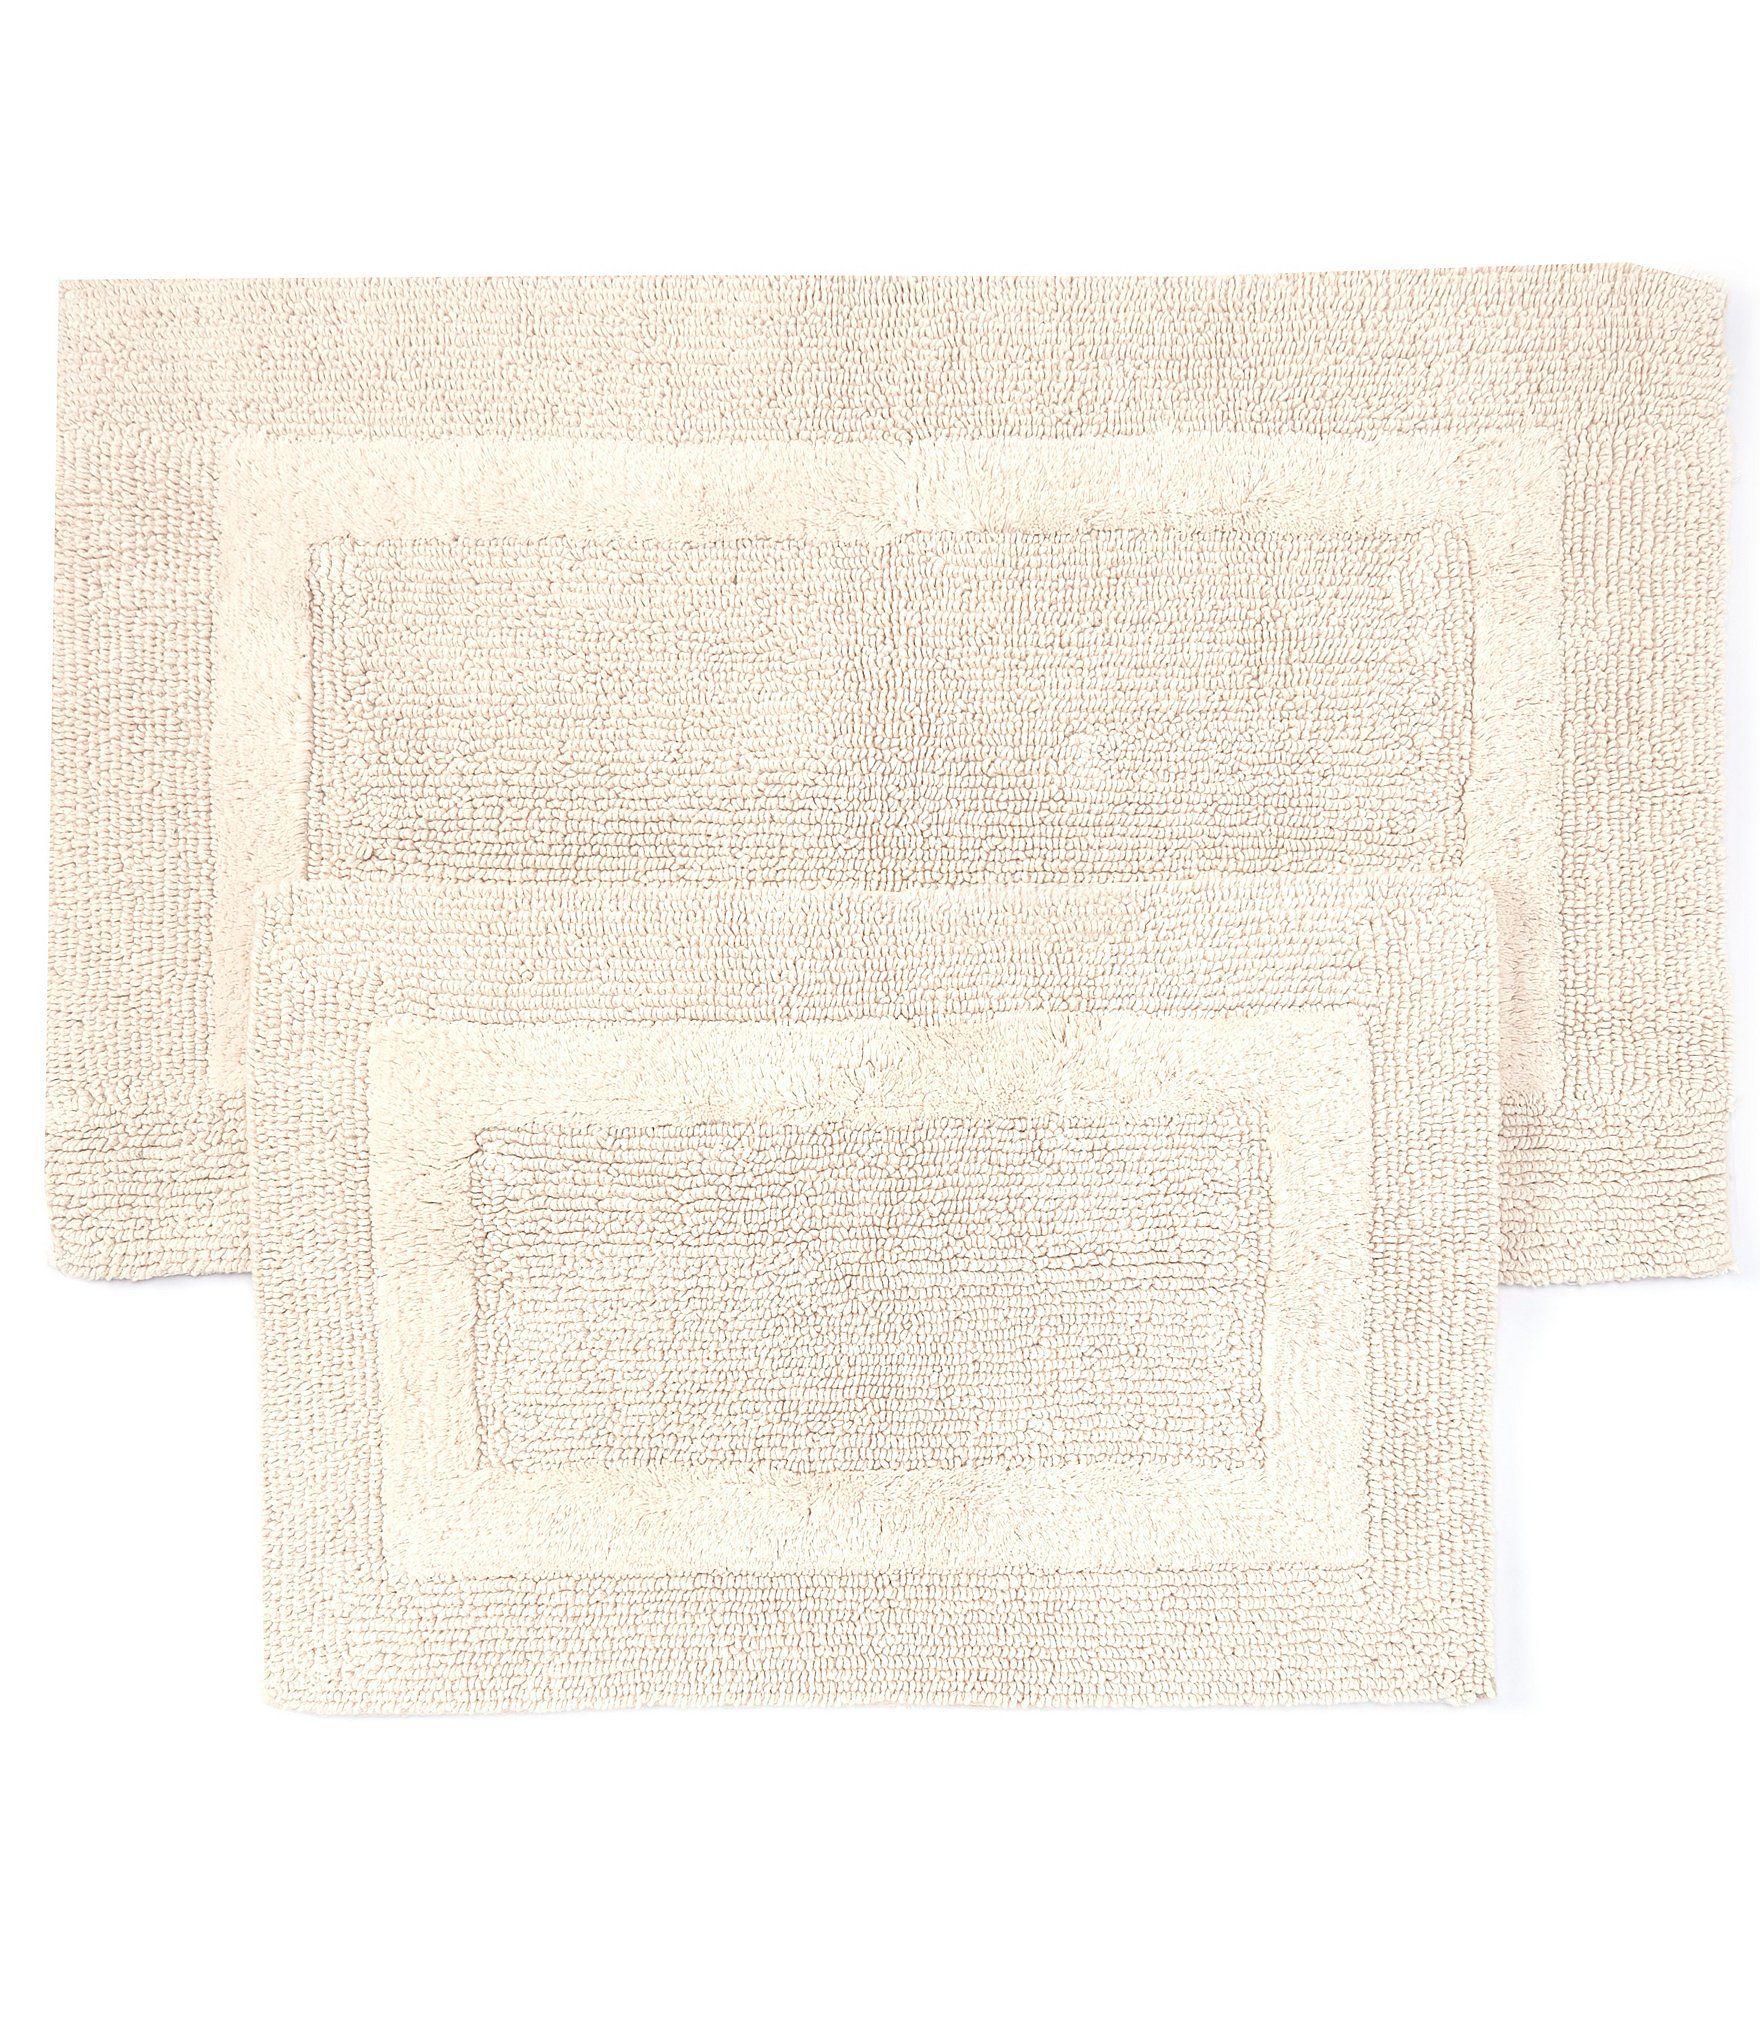 Southern Living Cotton Reversible Rug Dillard S Reversible Rug Medium Rugs Bath Runner Rugs [ 2040 x 1760 Pixel ]